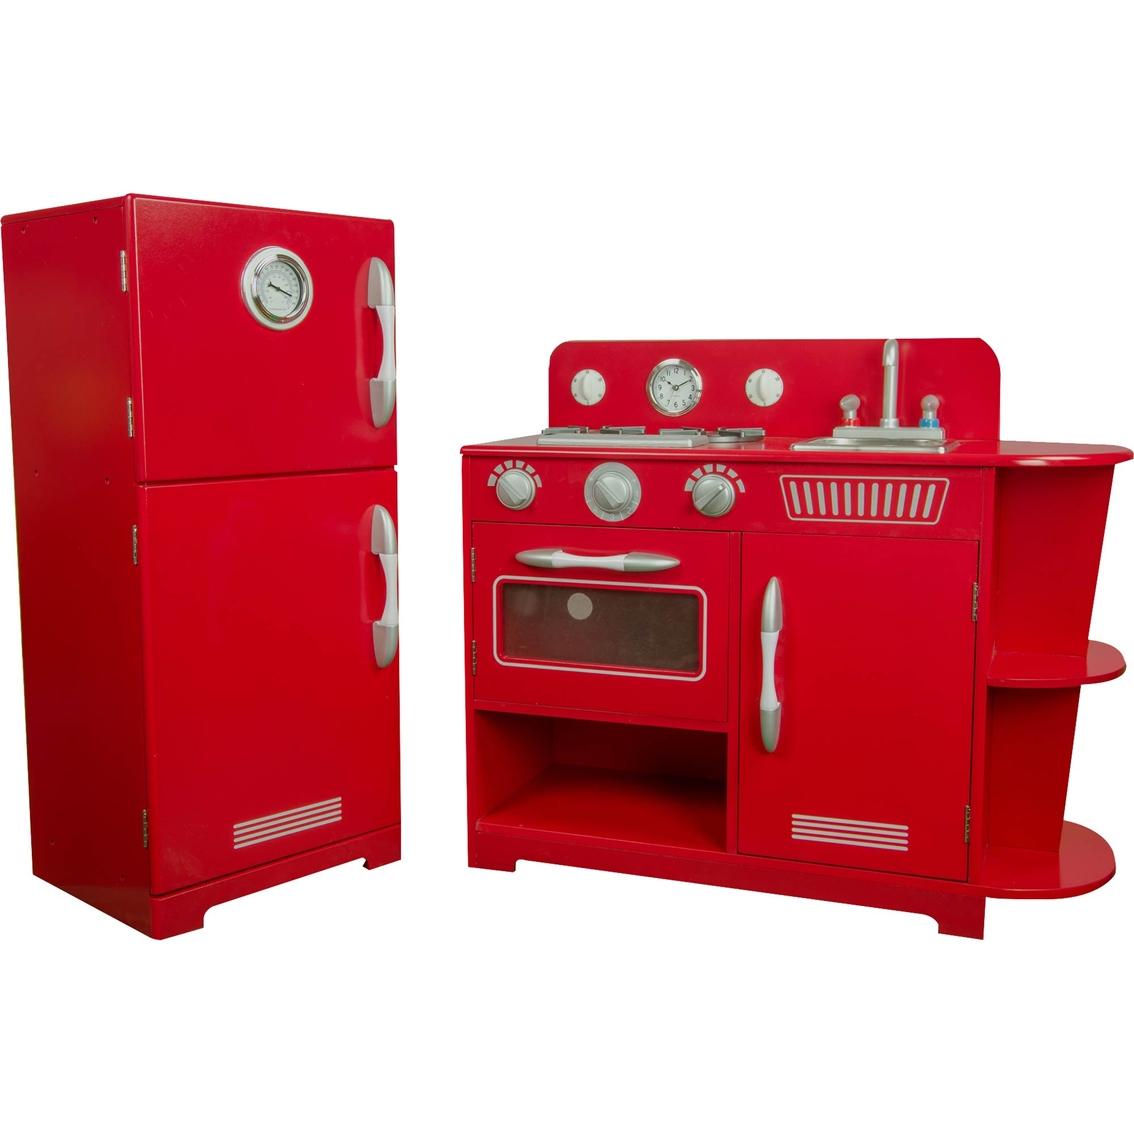 Teamson Kids Classic Kitchen Play Set